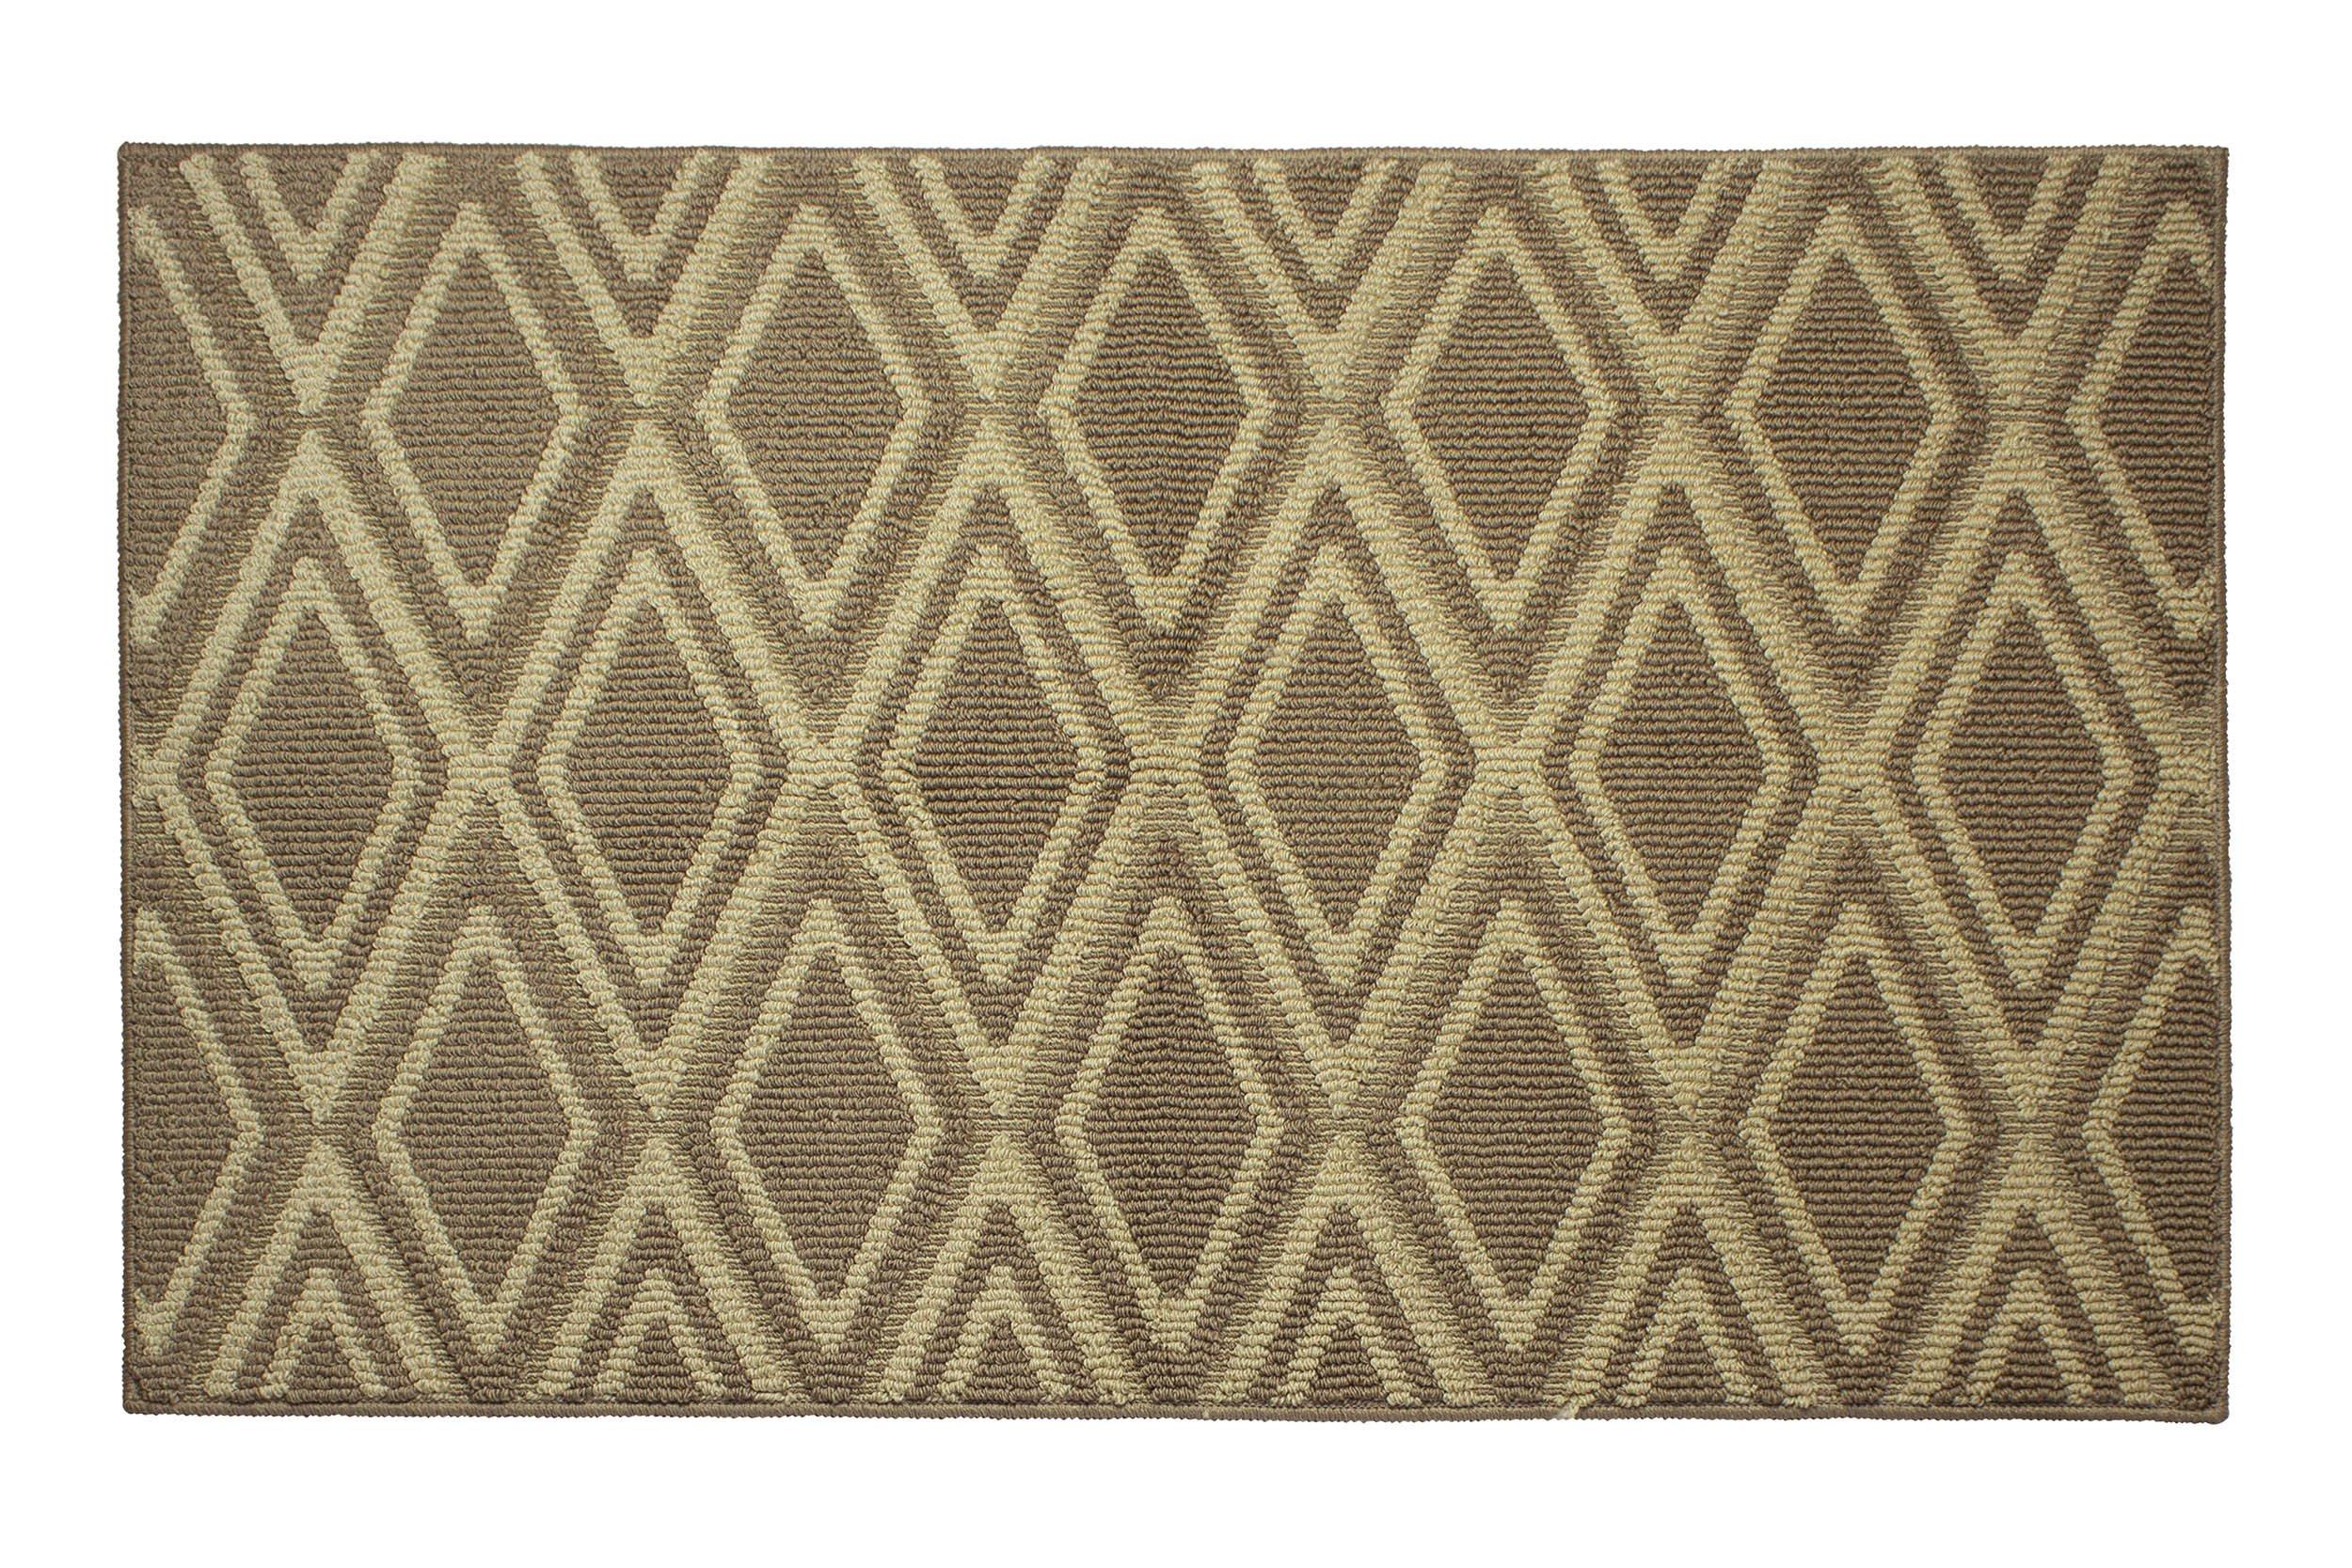 Jean Pierre All Loop Sean 28 x 48 in. Decorative Textured Accent Rug, Linen/Berber